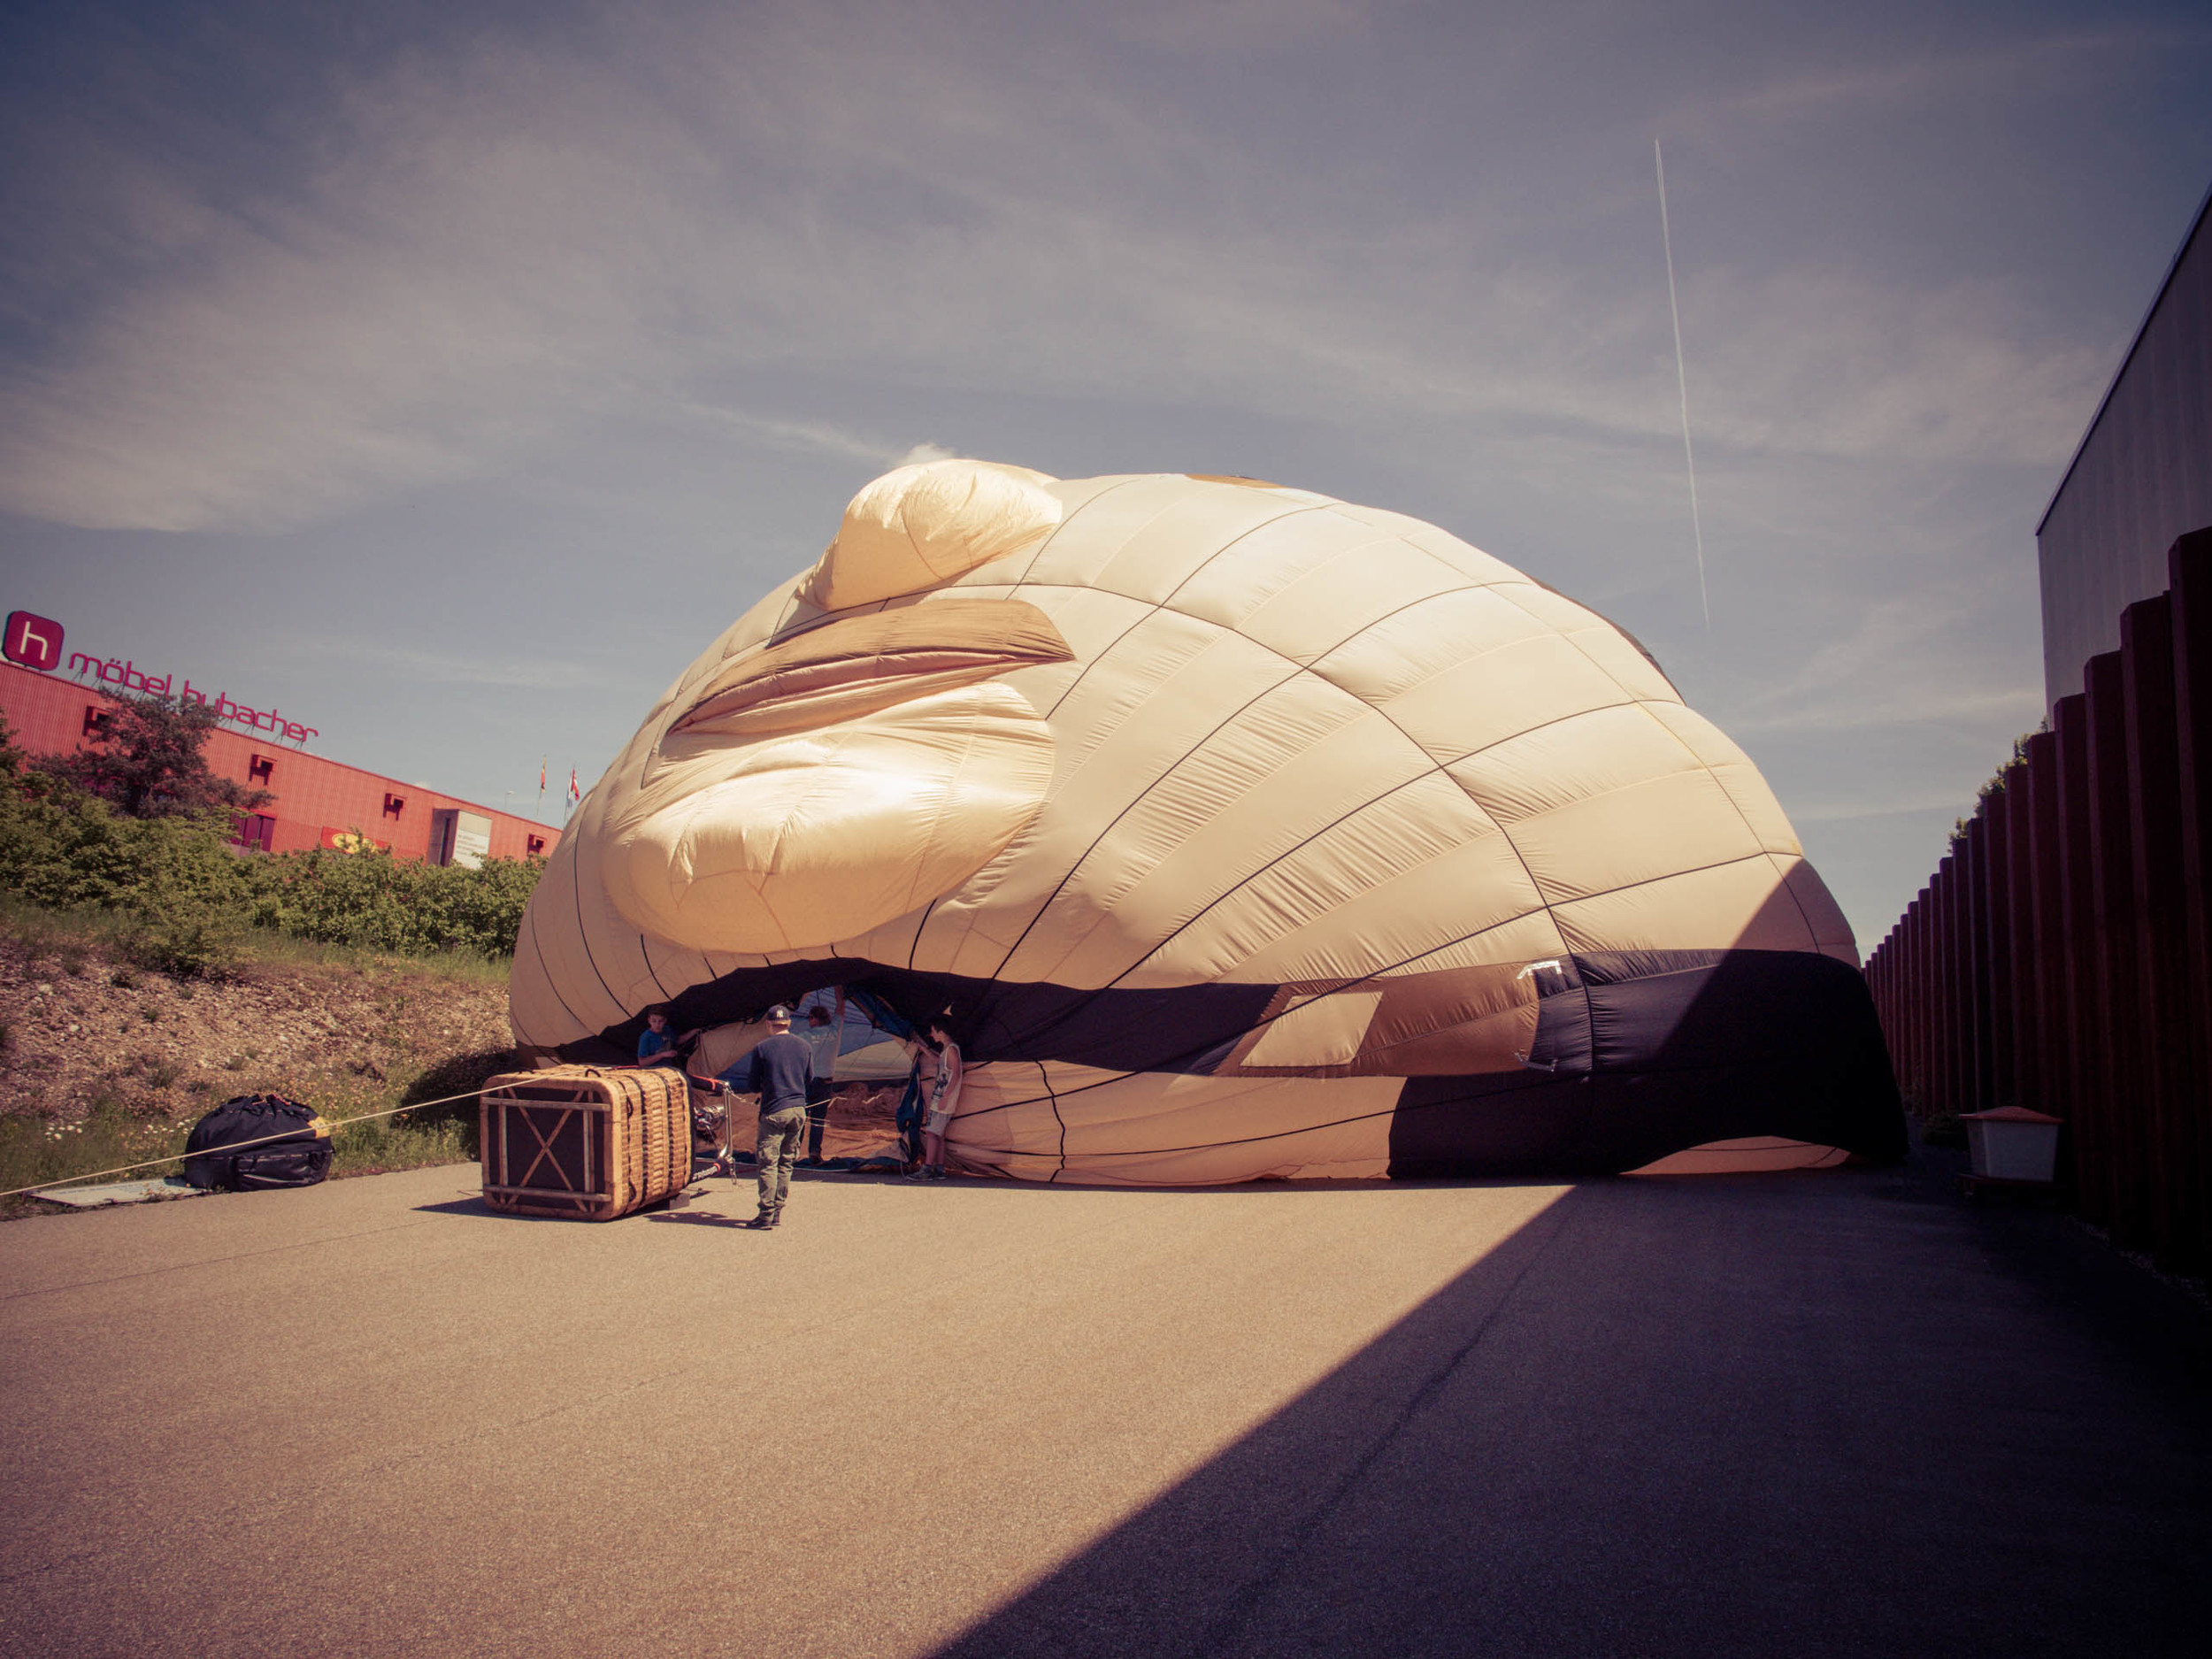 Heisslufballon_OMD-83.jpg